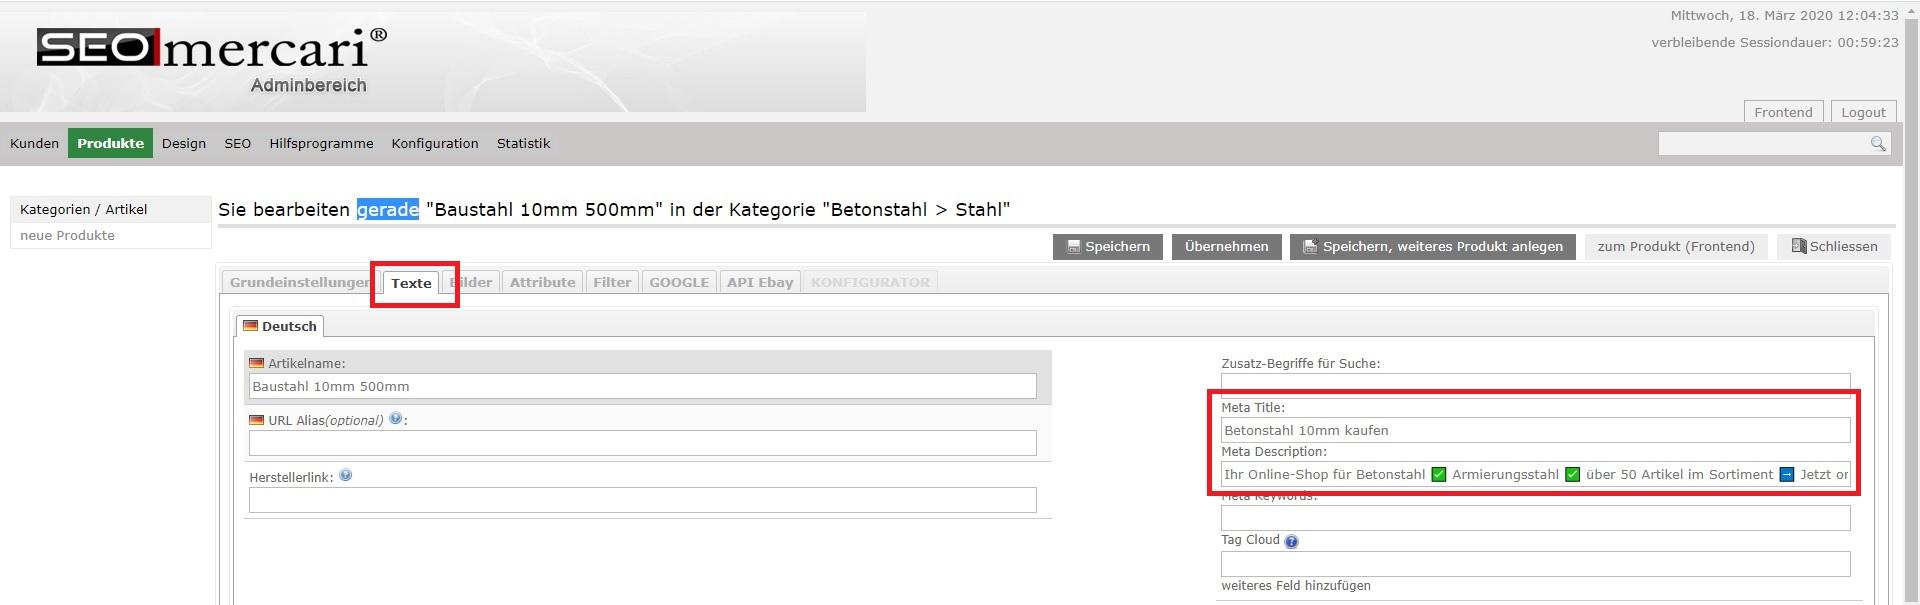 Metadaten-Eingabe in SEO:mercari - Artikel